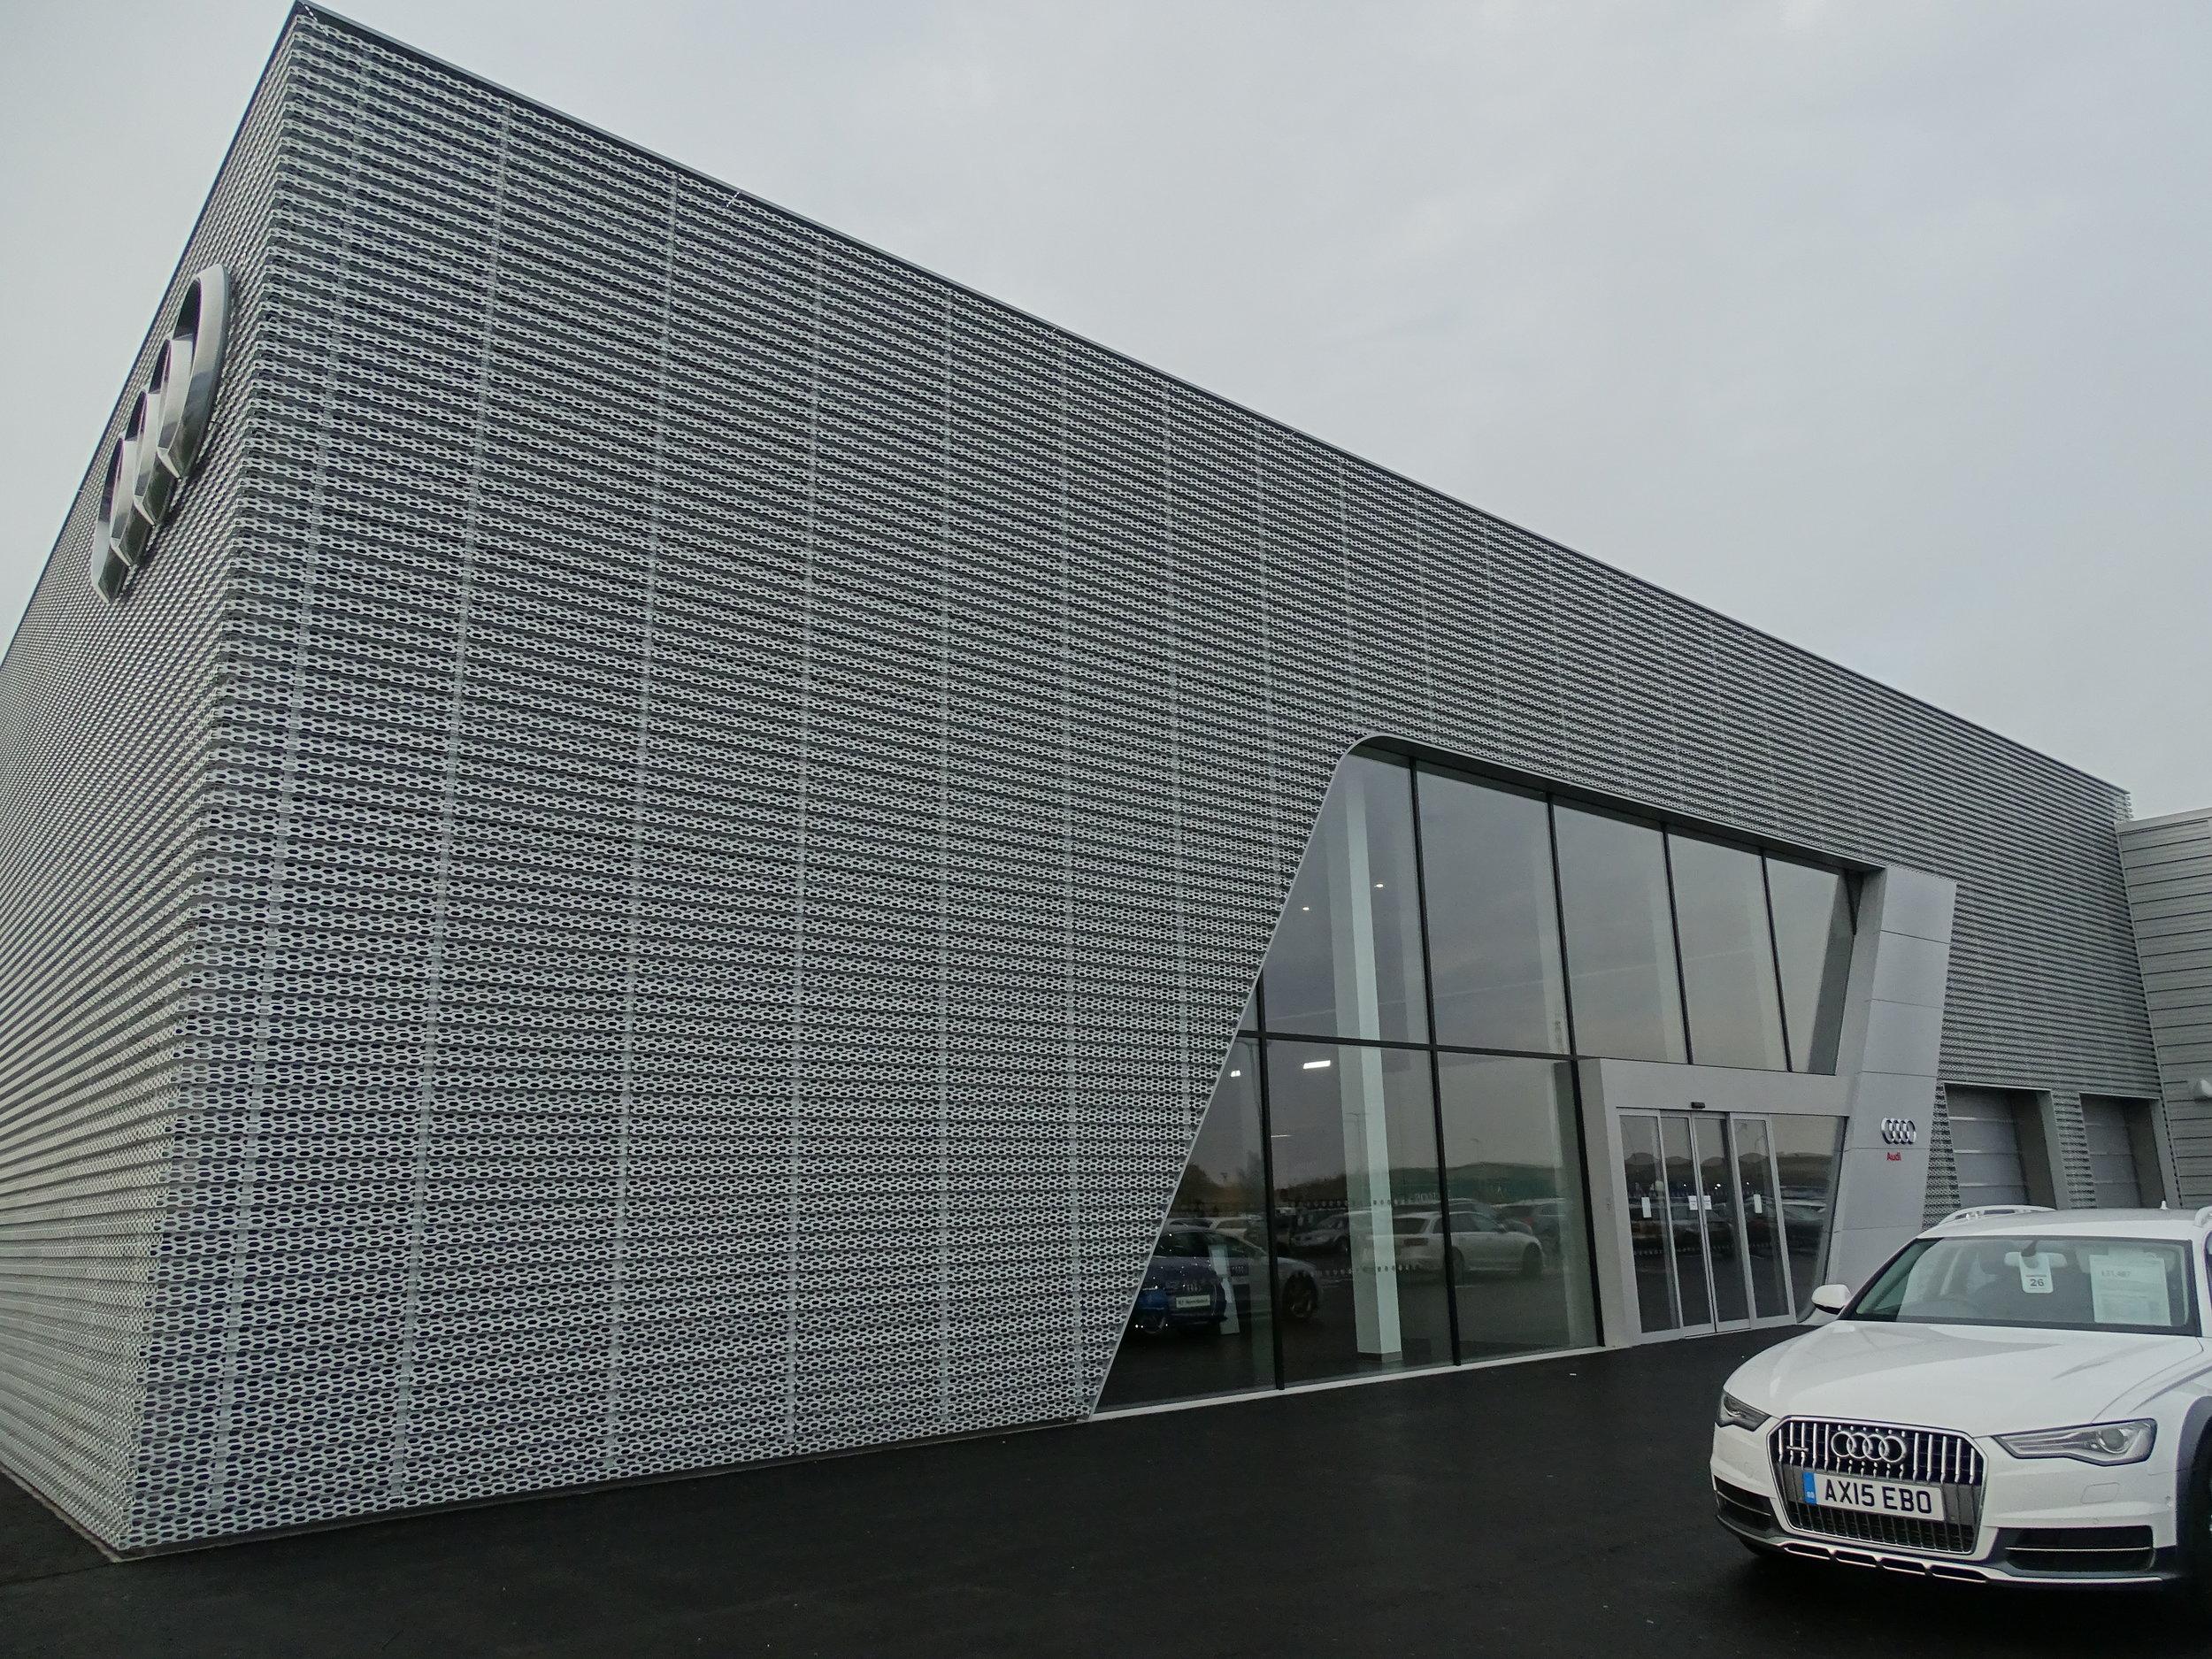 EDM Spanwall anodised aluminium perforated rainscreen cladding